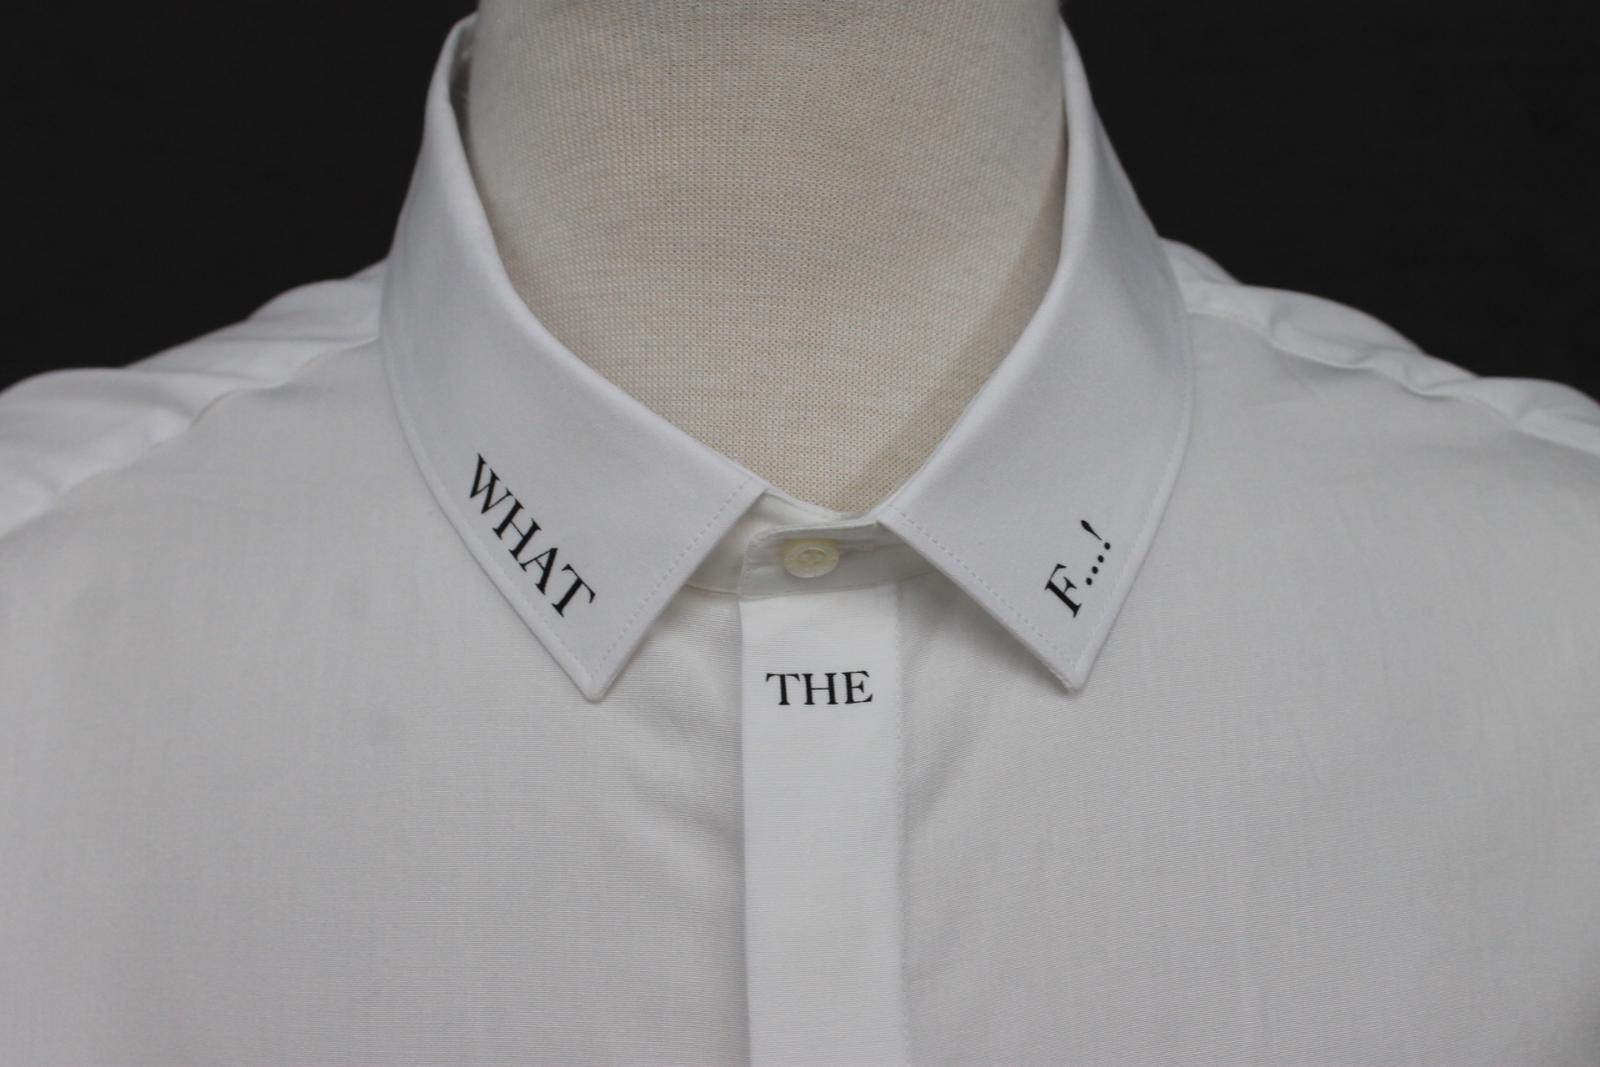 Neil-Barrett-Hombre-Blanco-De-Algodon-Manga-Negra-lo-que-el-F-Con-Cuello-Camisa-17-034 miniatura 3